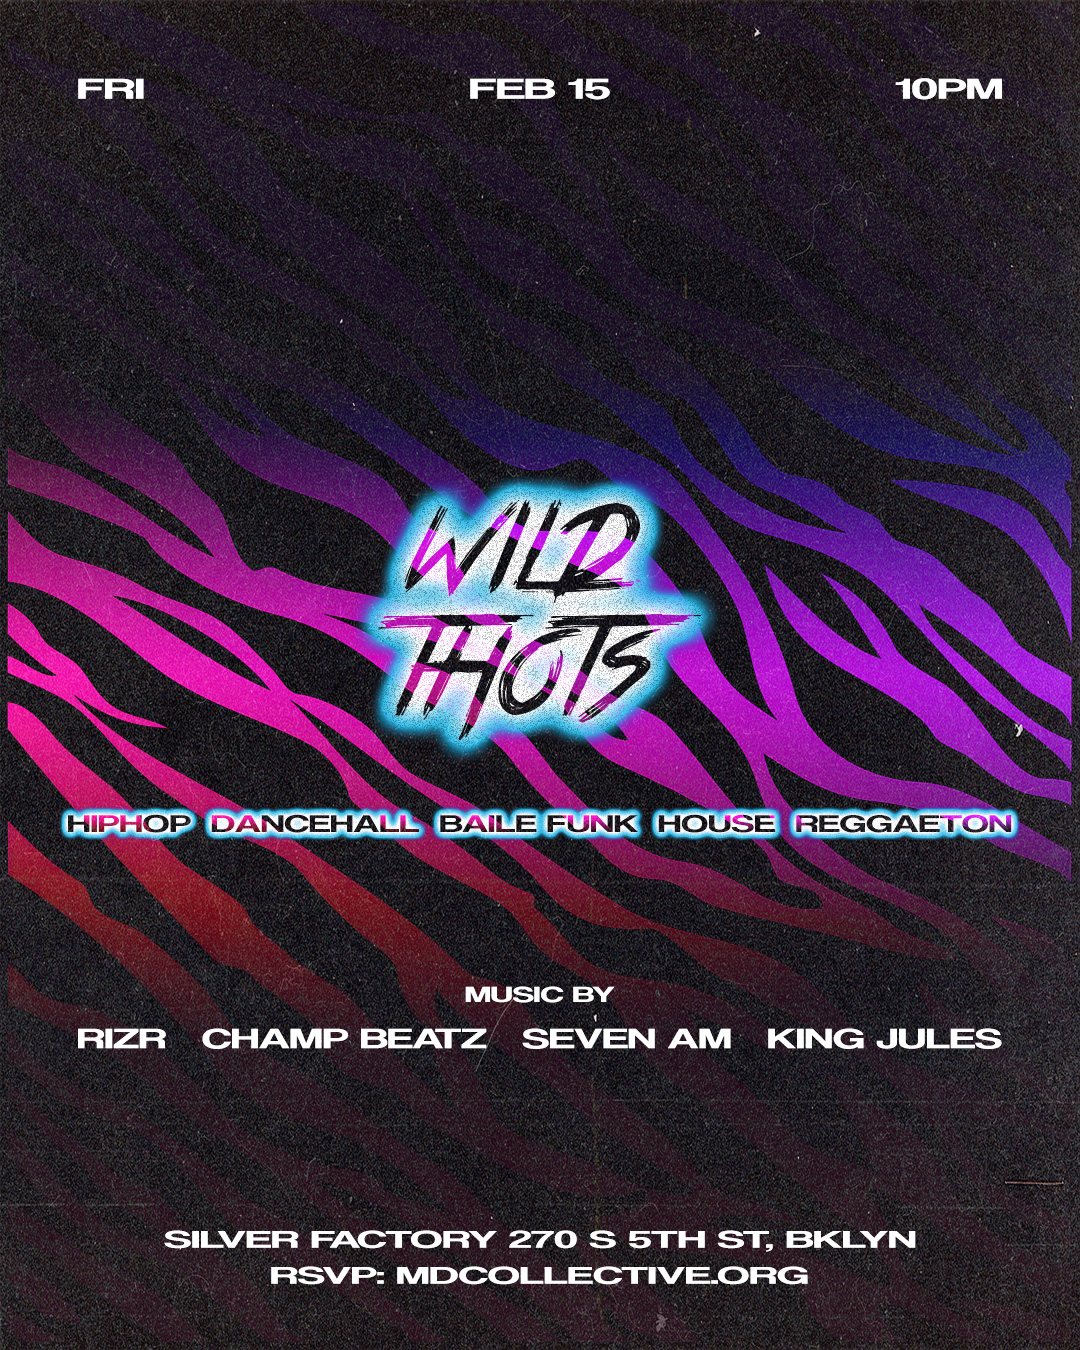 Wild-Thots-Flyer.jpg